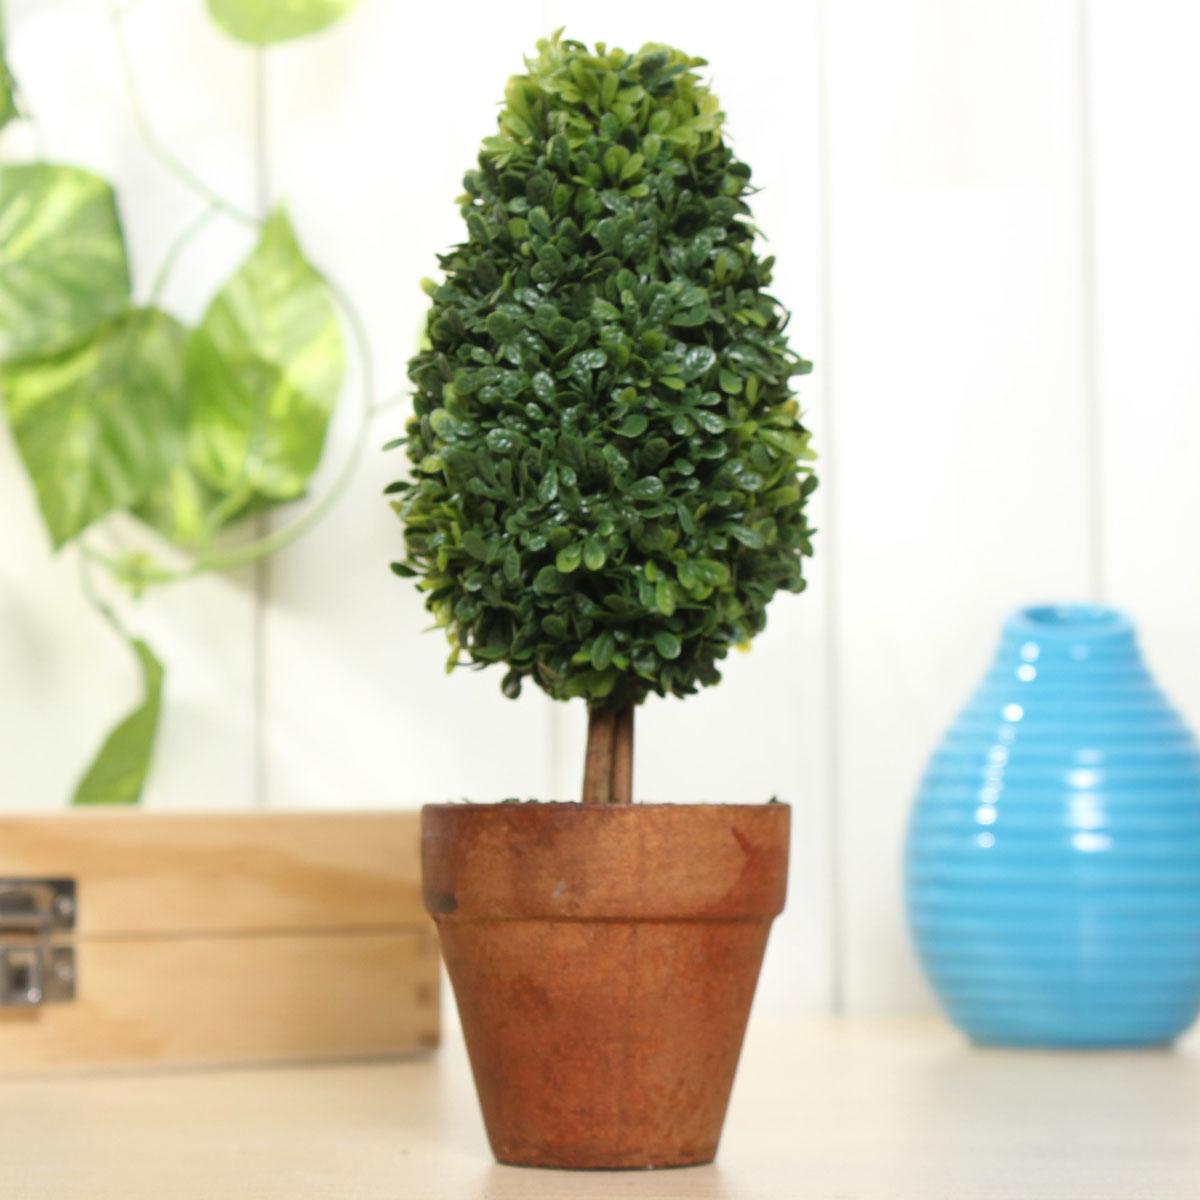 Artificial Potted Plant Plastic Garden Grass Ball Topiary Tree Pot Home Desk Decor